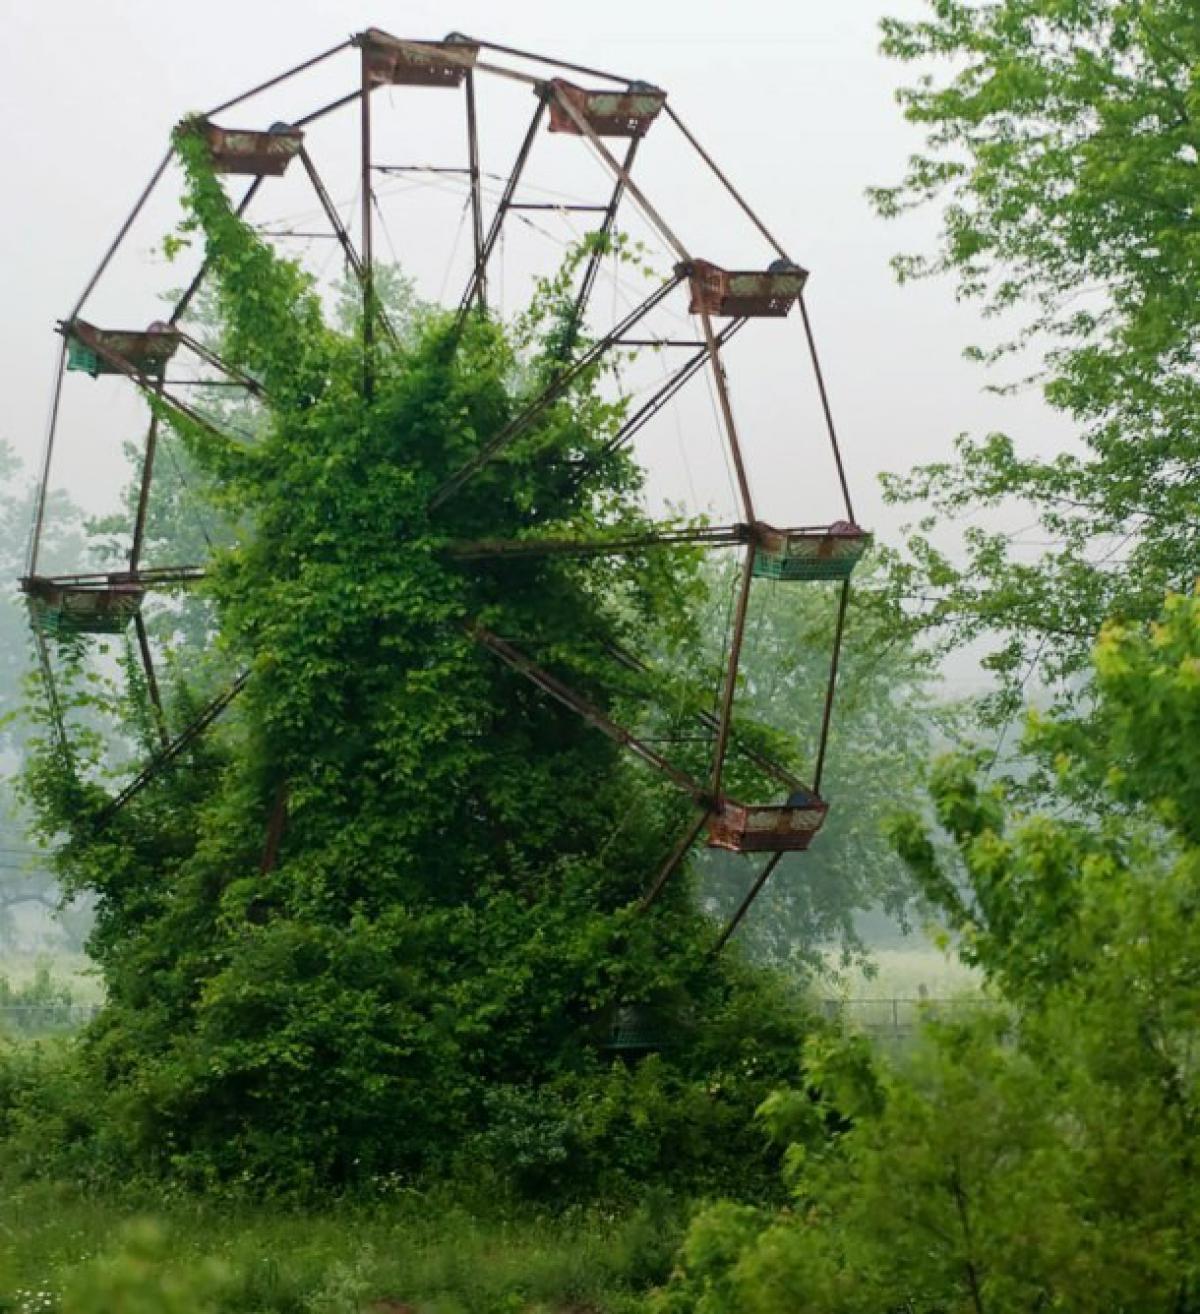 designbump-com-nature-reclaiming-abandoned-places-